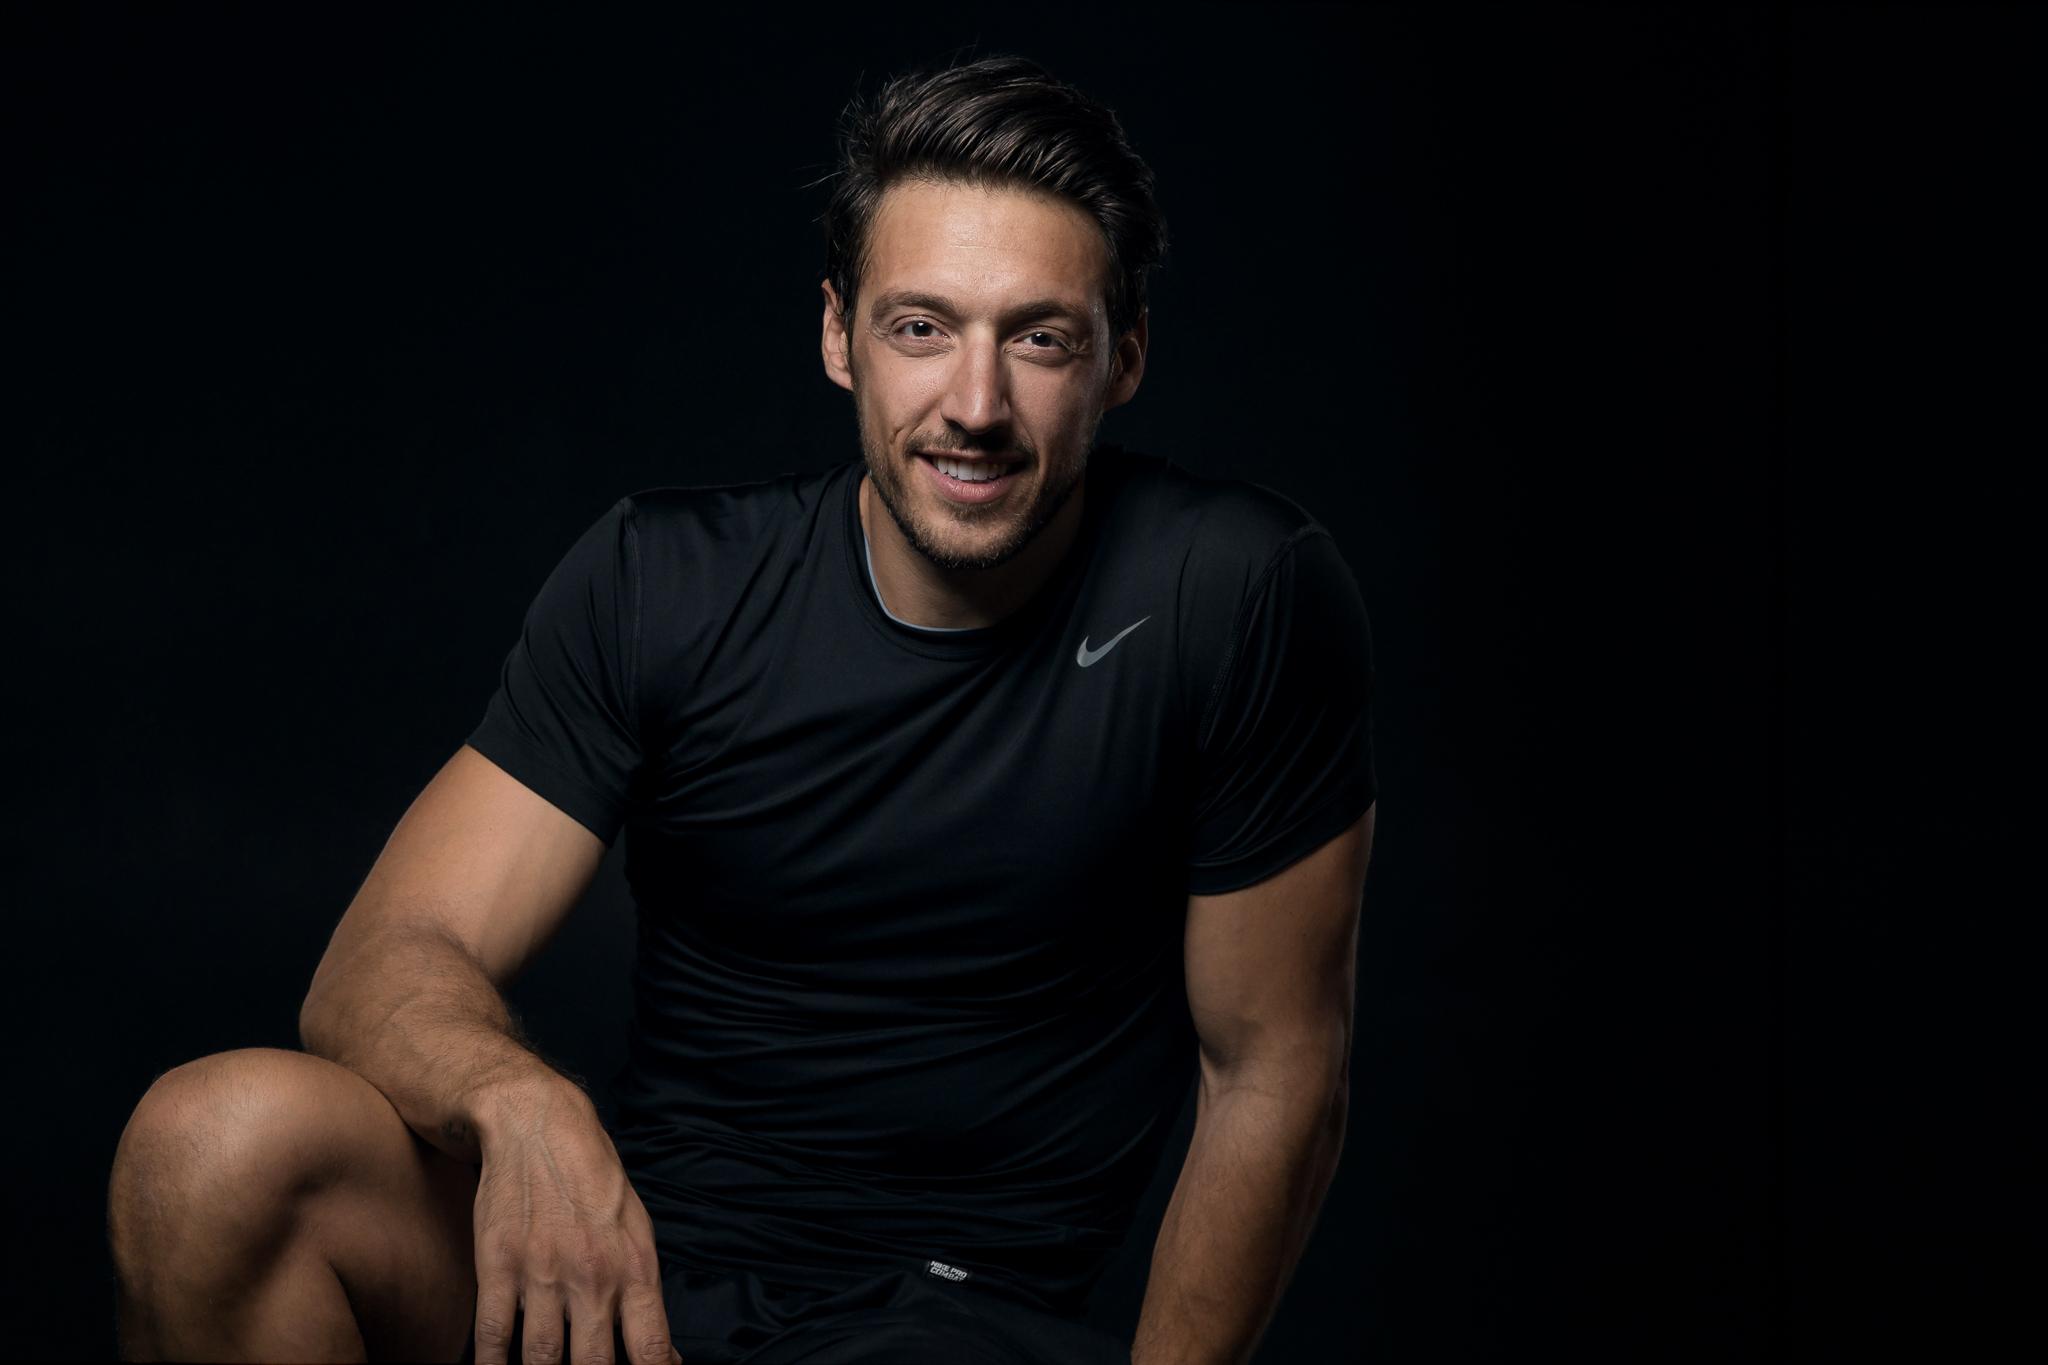 kostis sohoritis fitness photography Giorgos Kitsantas Concept One 14.jpg